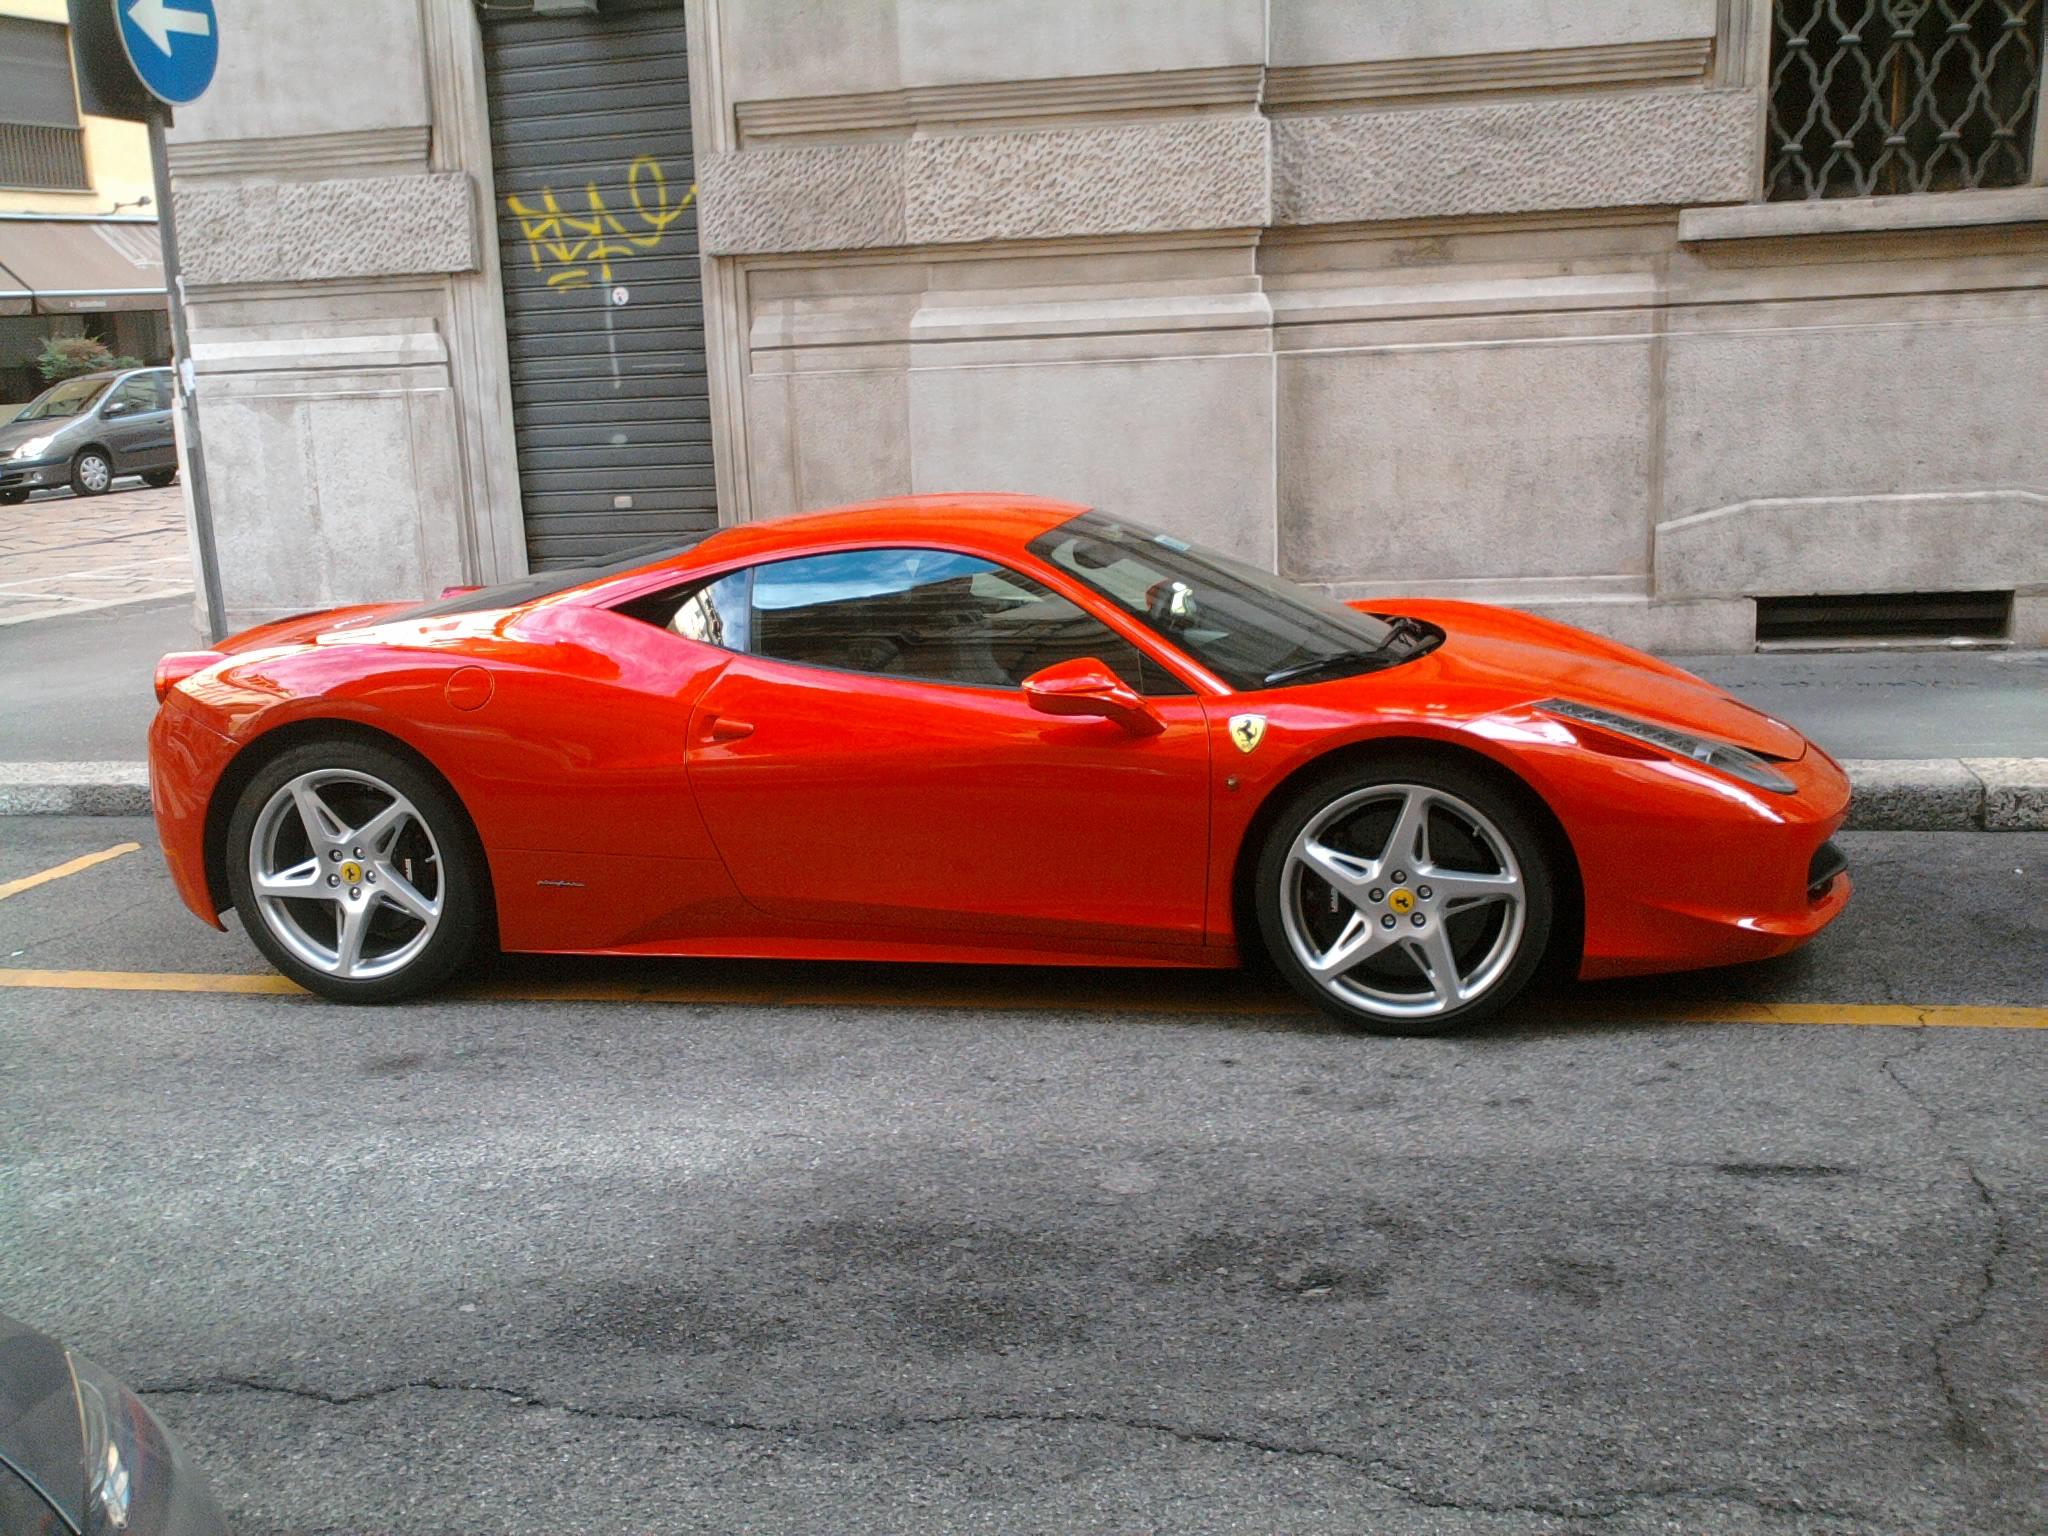 file39 10 italy ferrari 458 italia rossa a milano 03jpg - Ferrari Italia 458